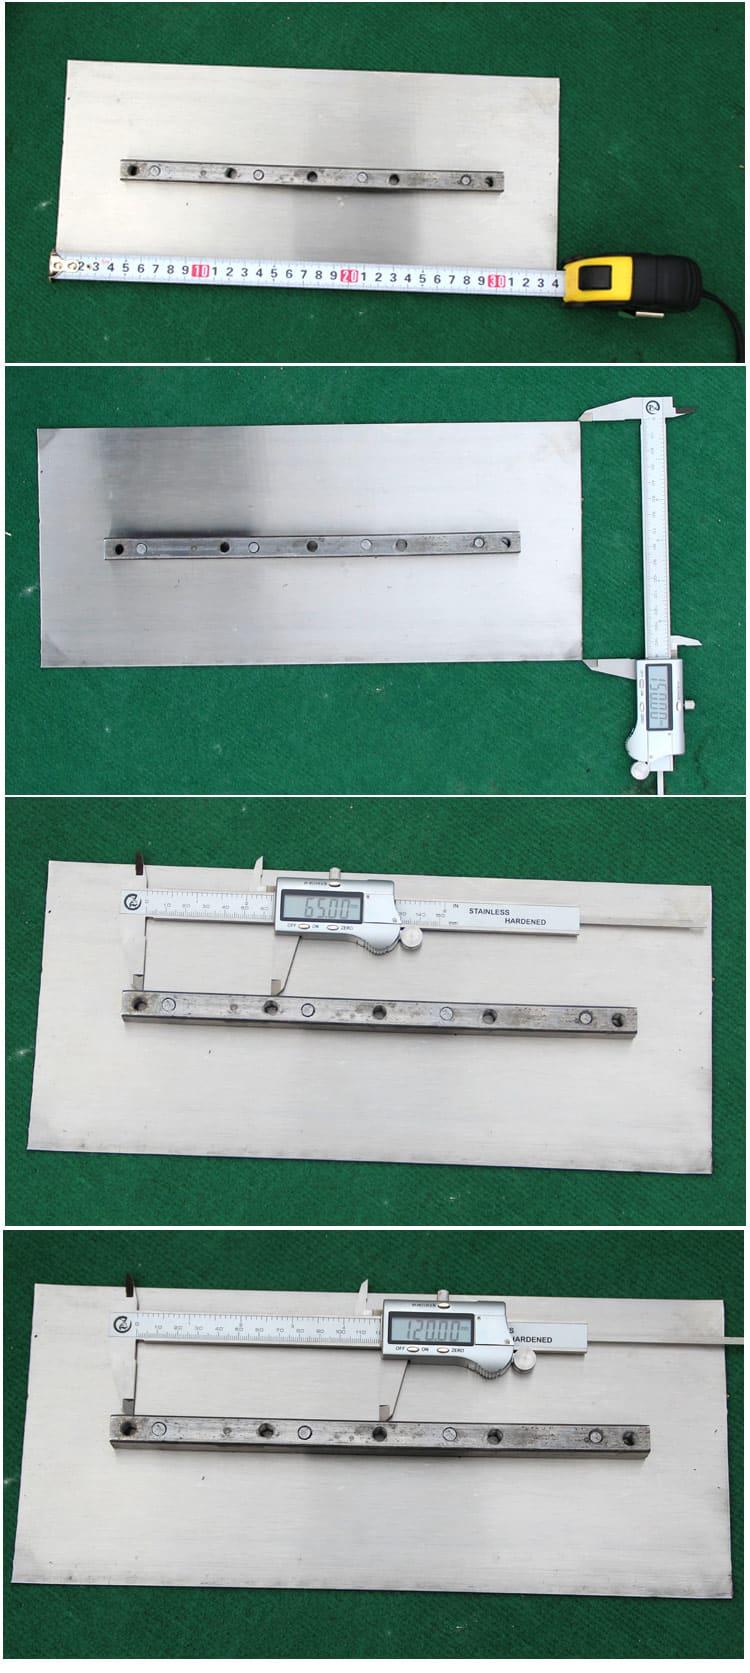 the-blade-of-100cm-power-trowel